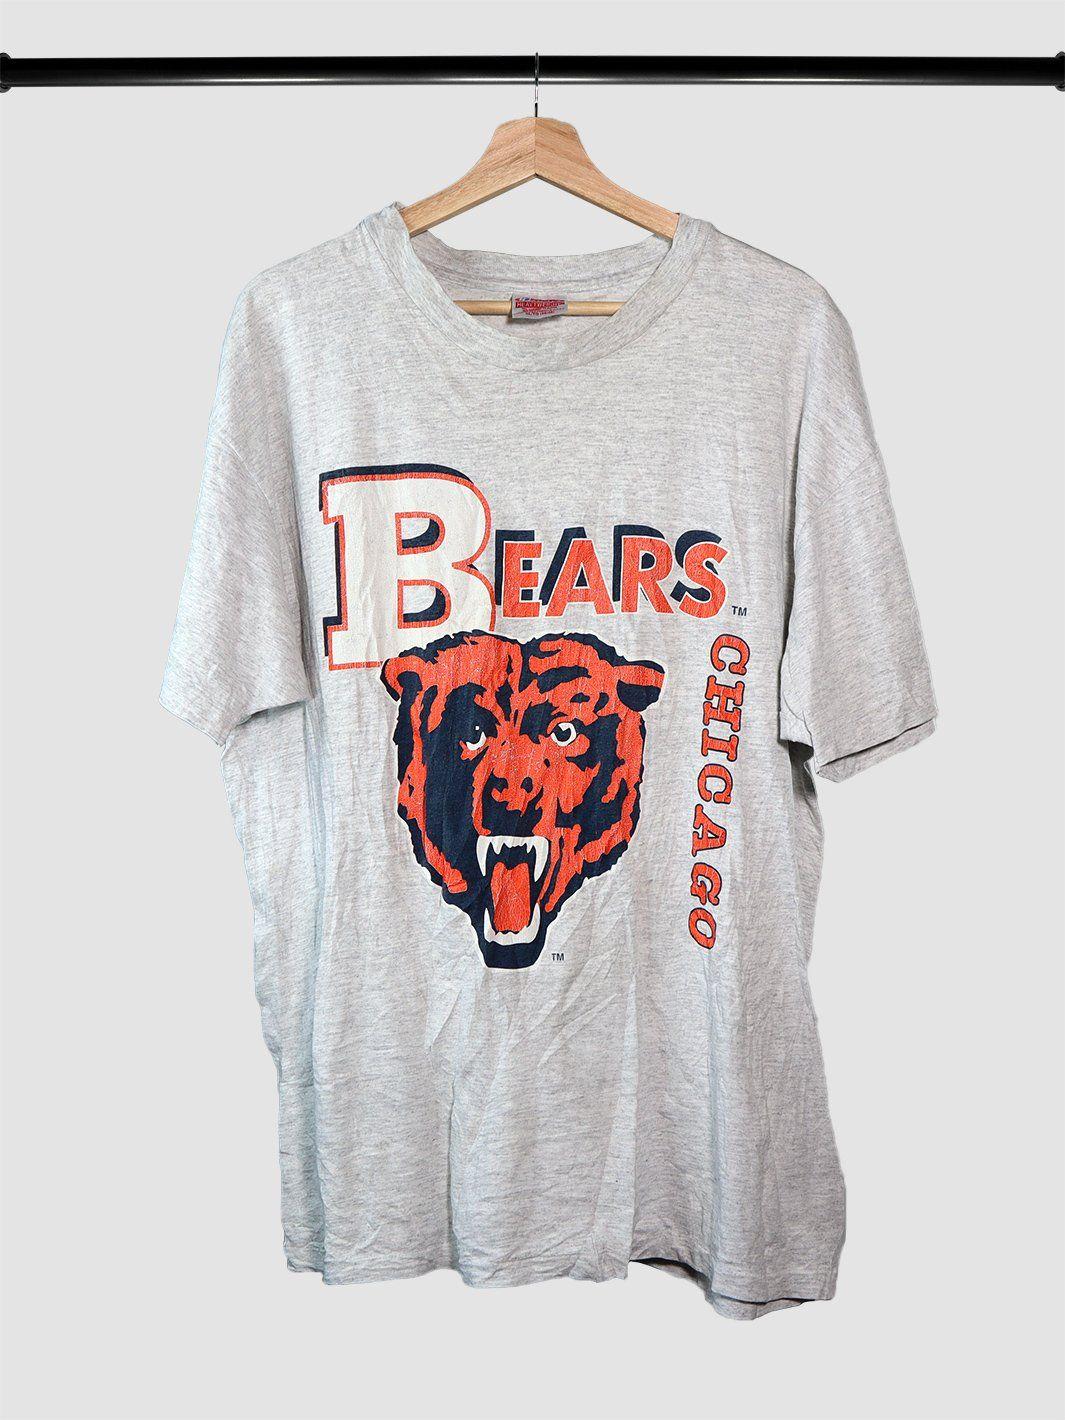 Chicago Bears Late 1990s T-Shirt (XL) - XL